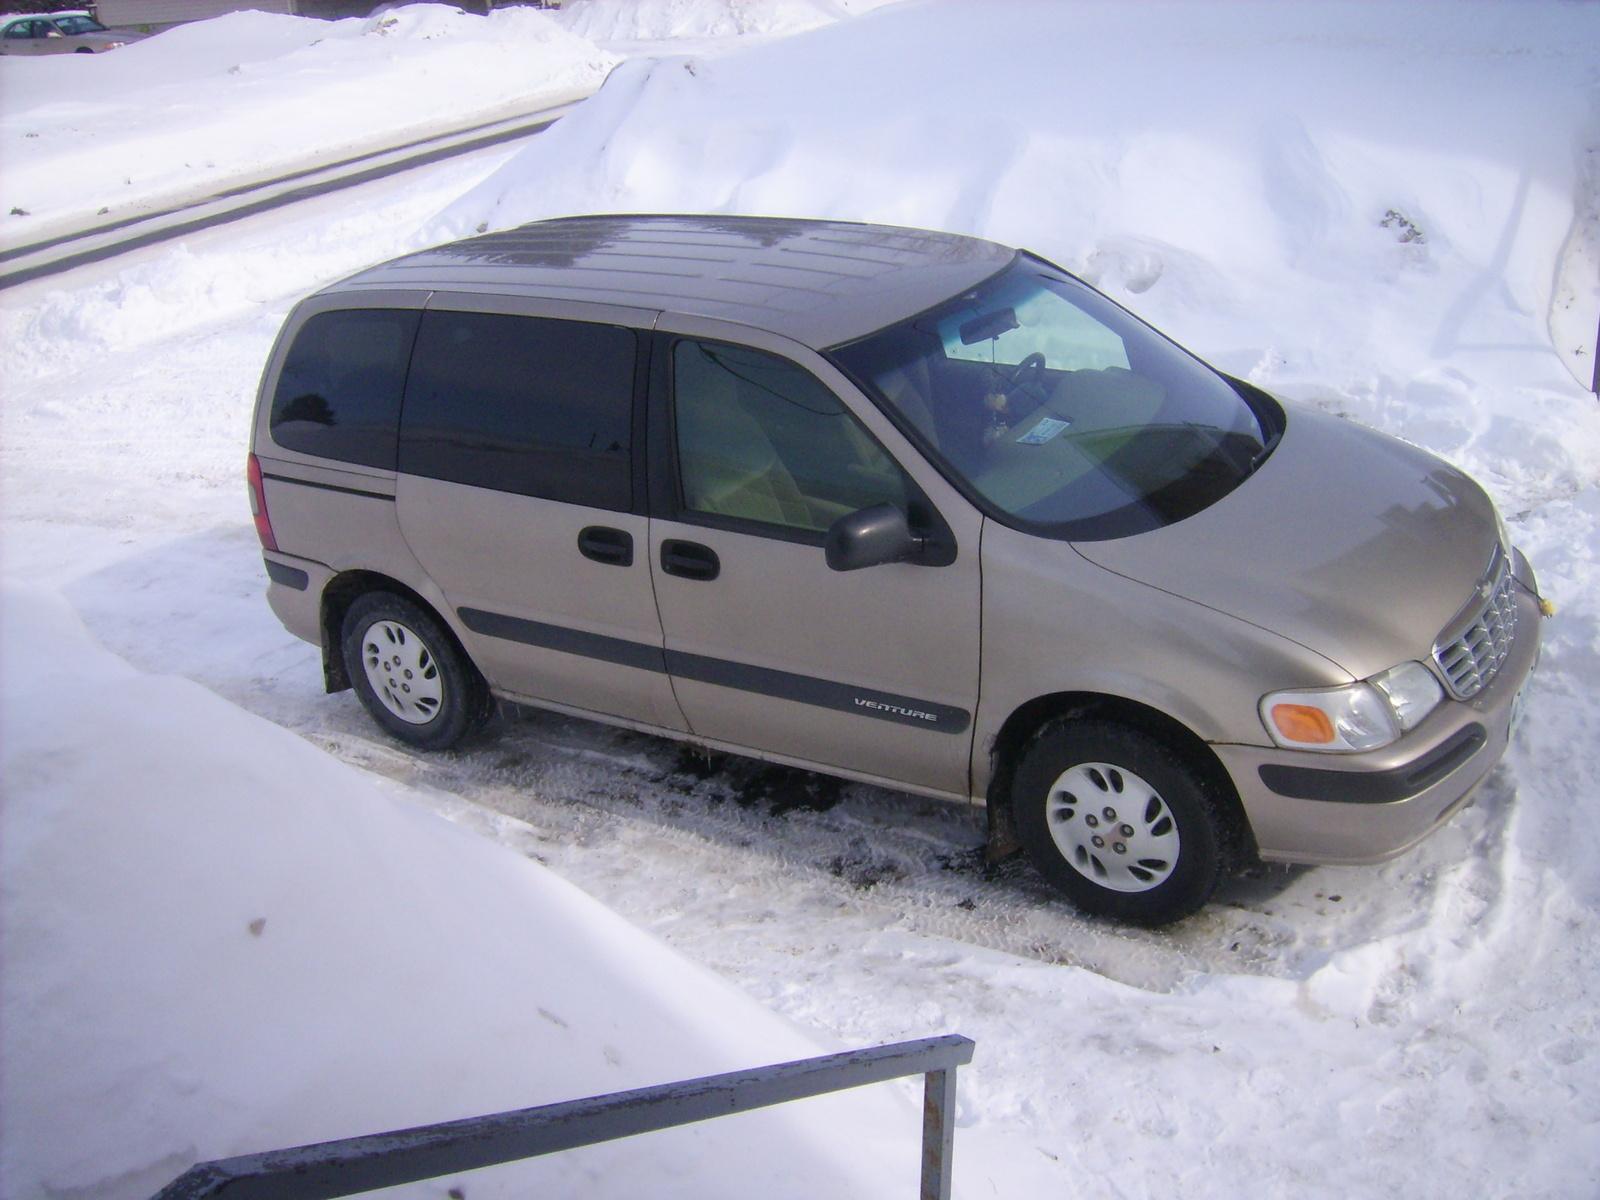 Chevrolet Venture 1997 foto - 2